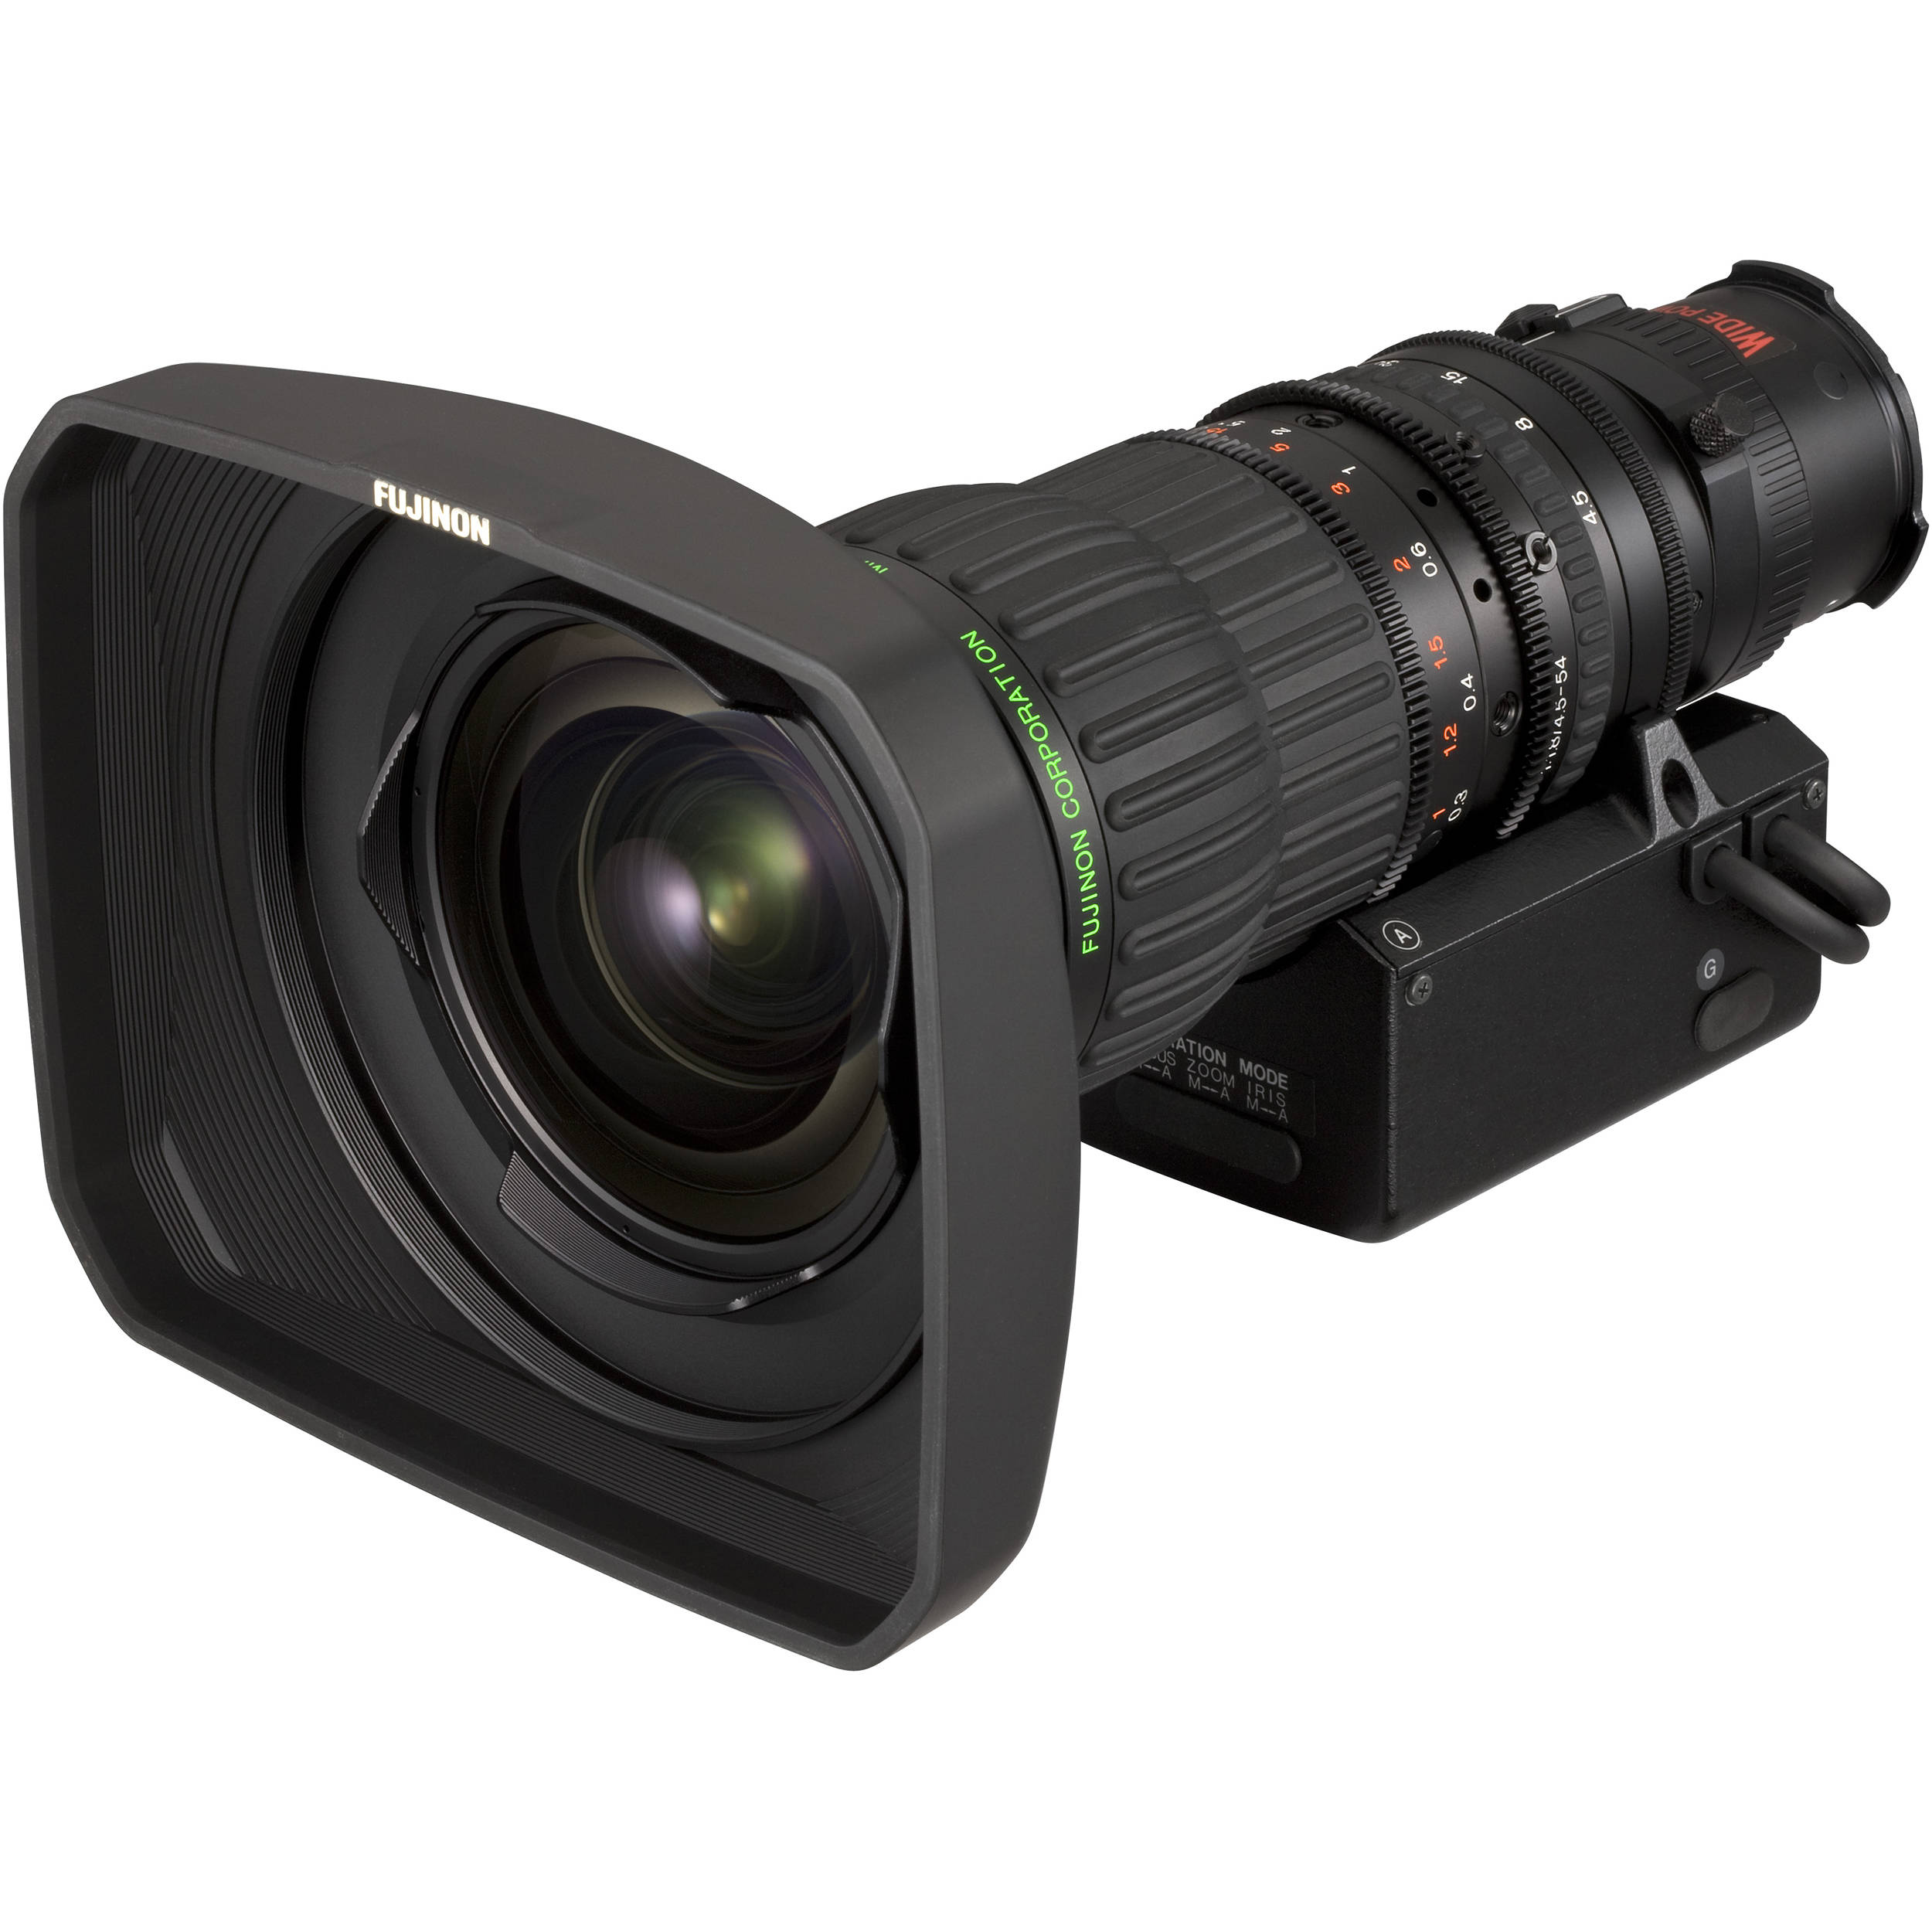 fujinon 4 5 54mm f 1 8 2 4 lens with digital za12x4 5bzd t58 b h. Black Bedroom Furniture Sets. Home Design Ideas